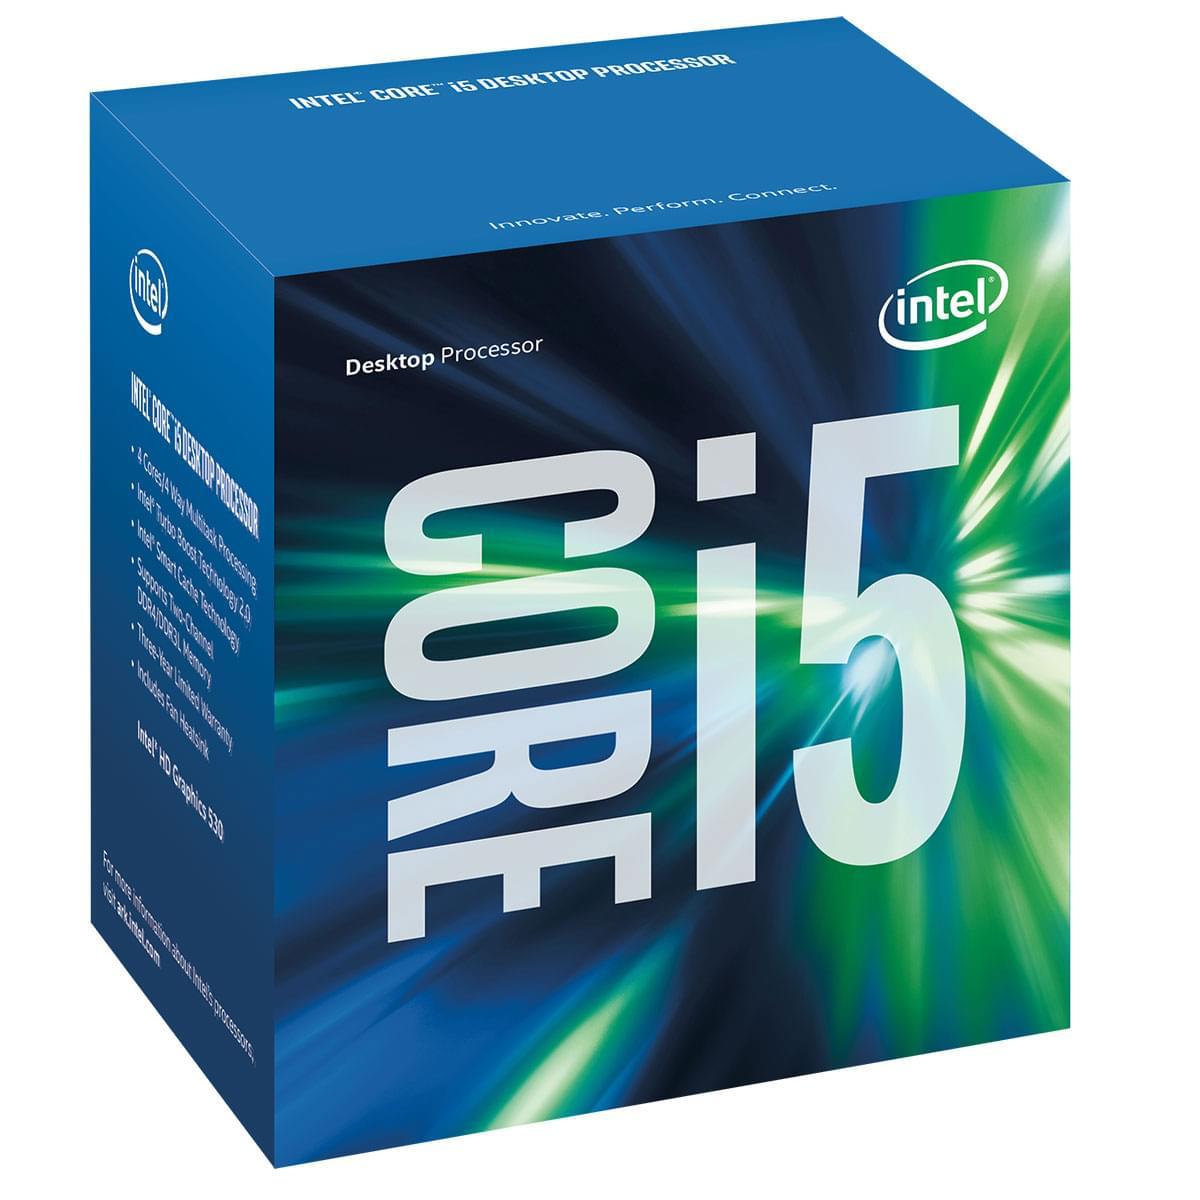 Processeur Intel Core i5 6500 - 3.2GHz - Gamer -  - 0